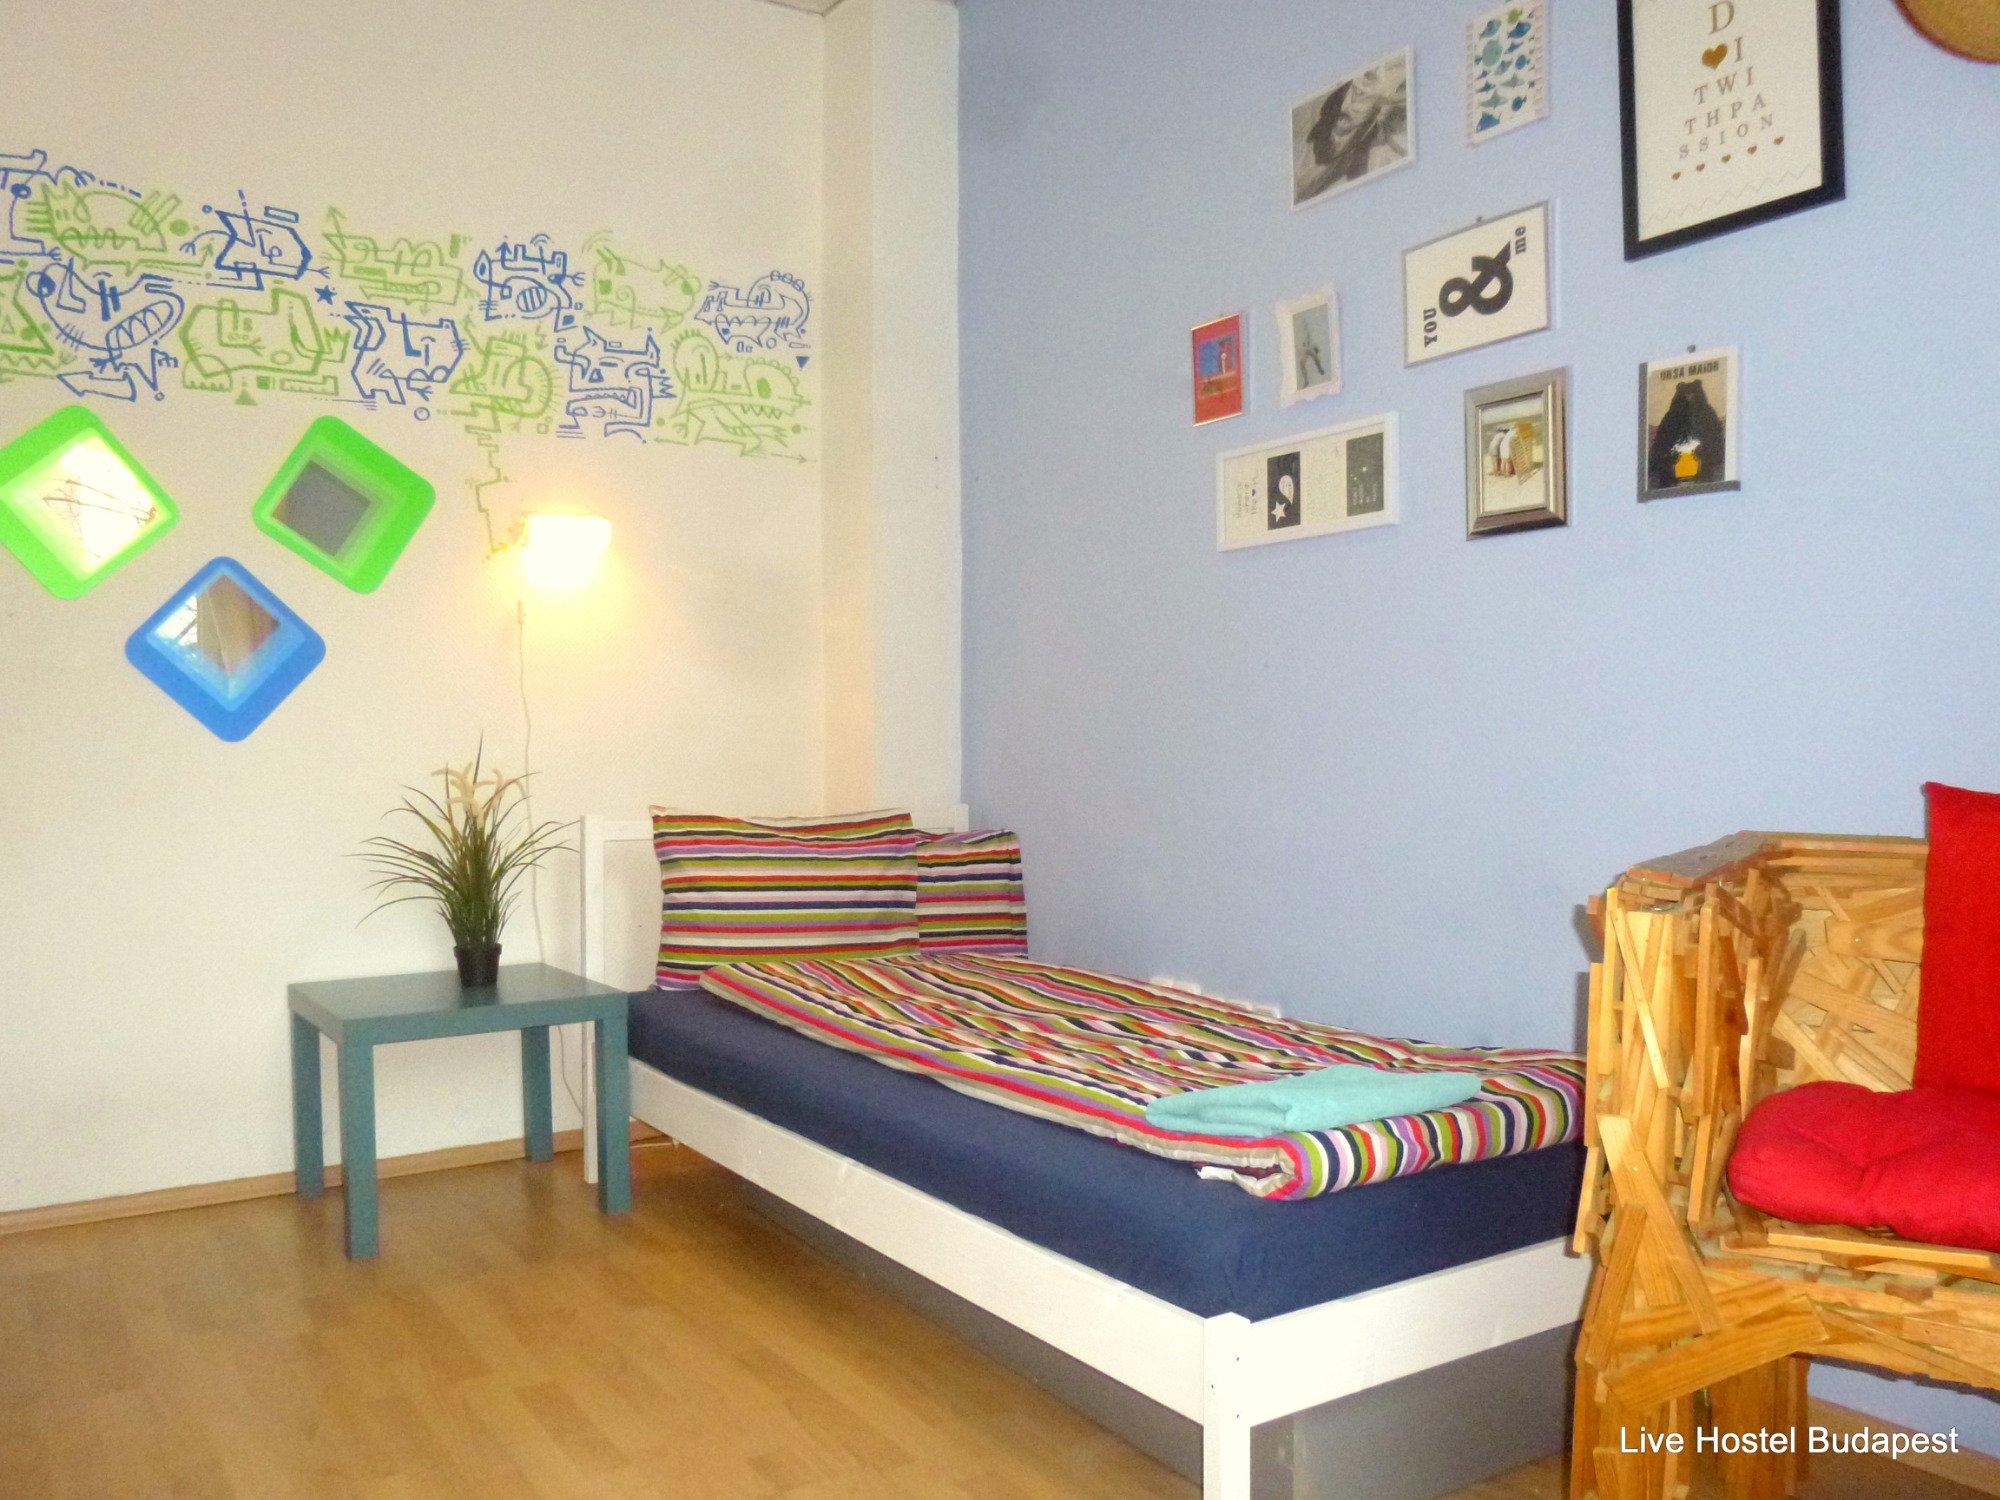 Live Hostel